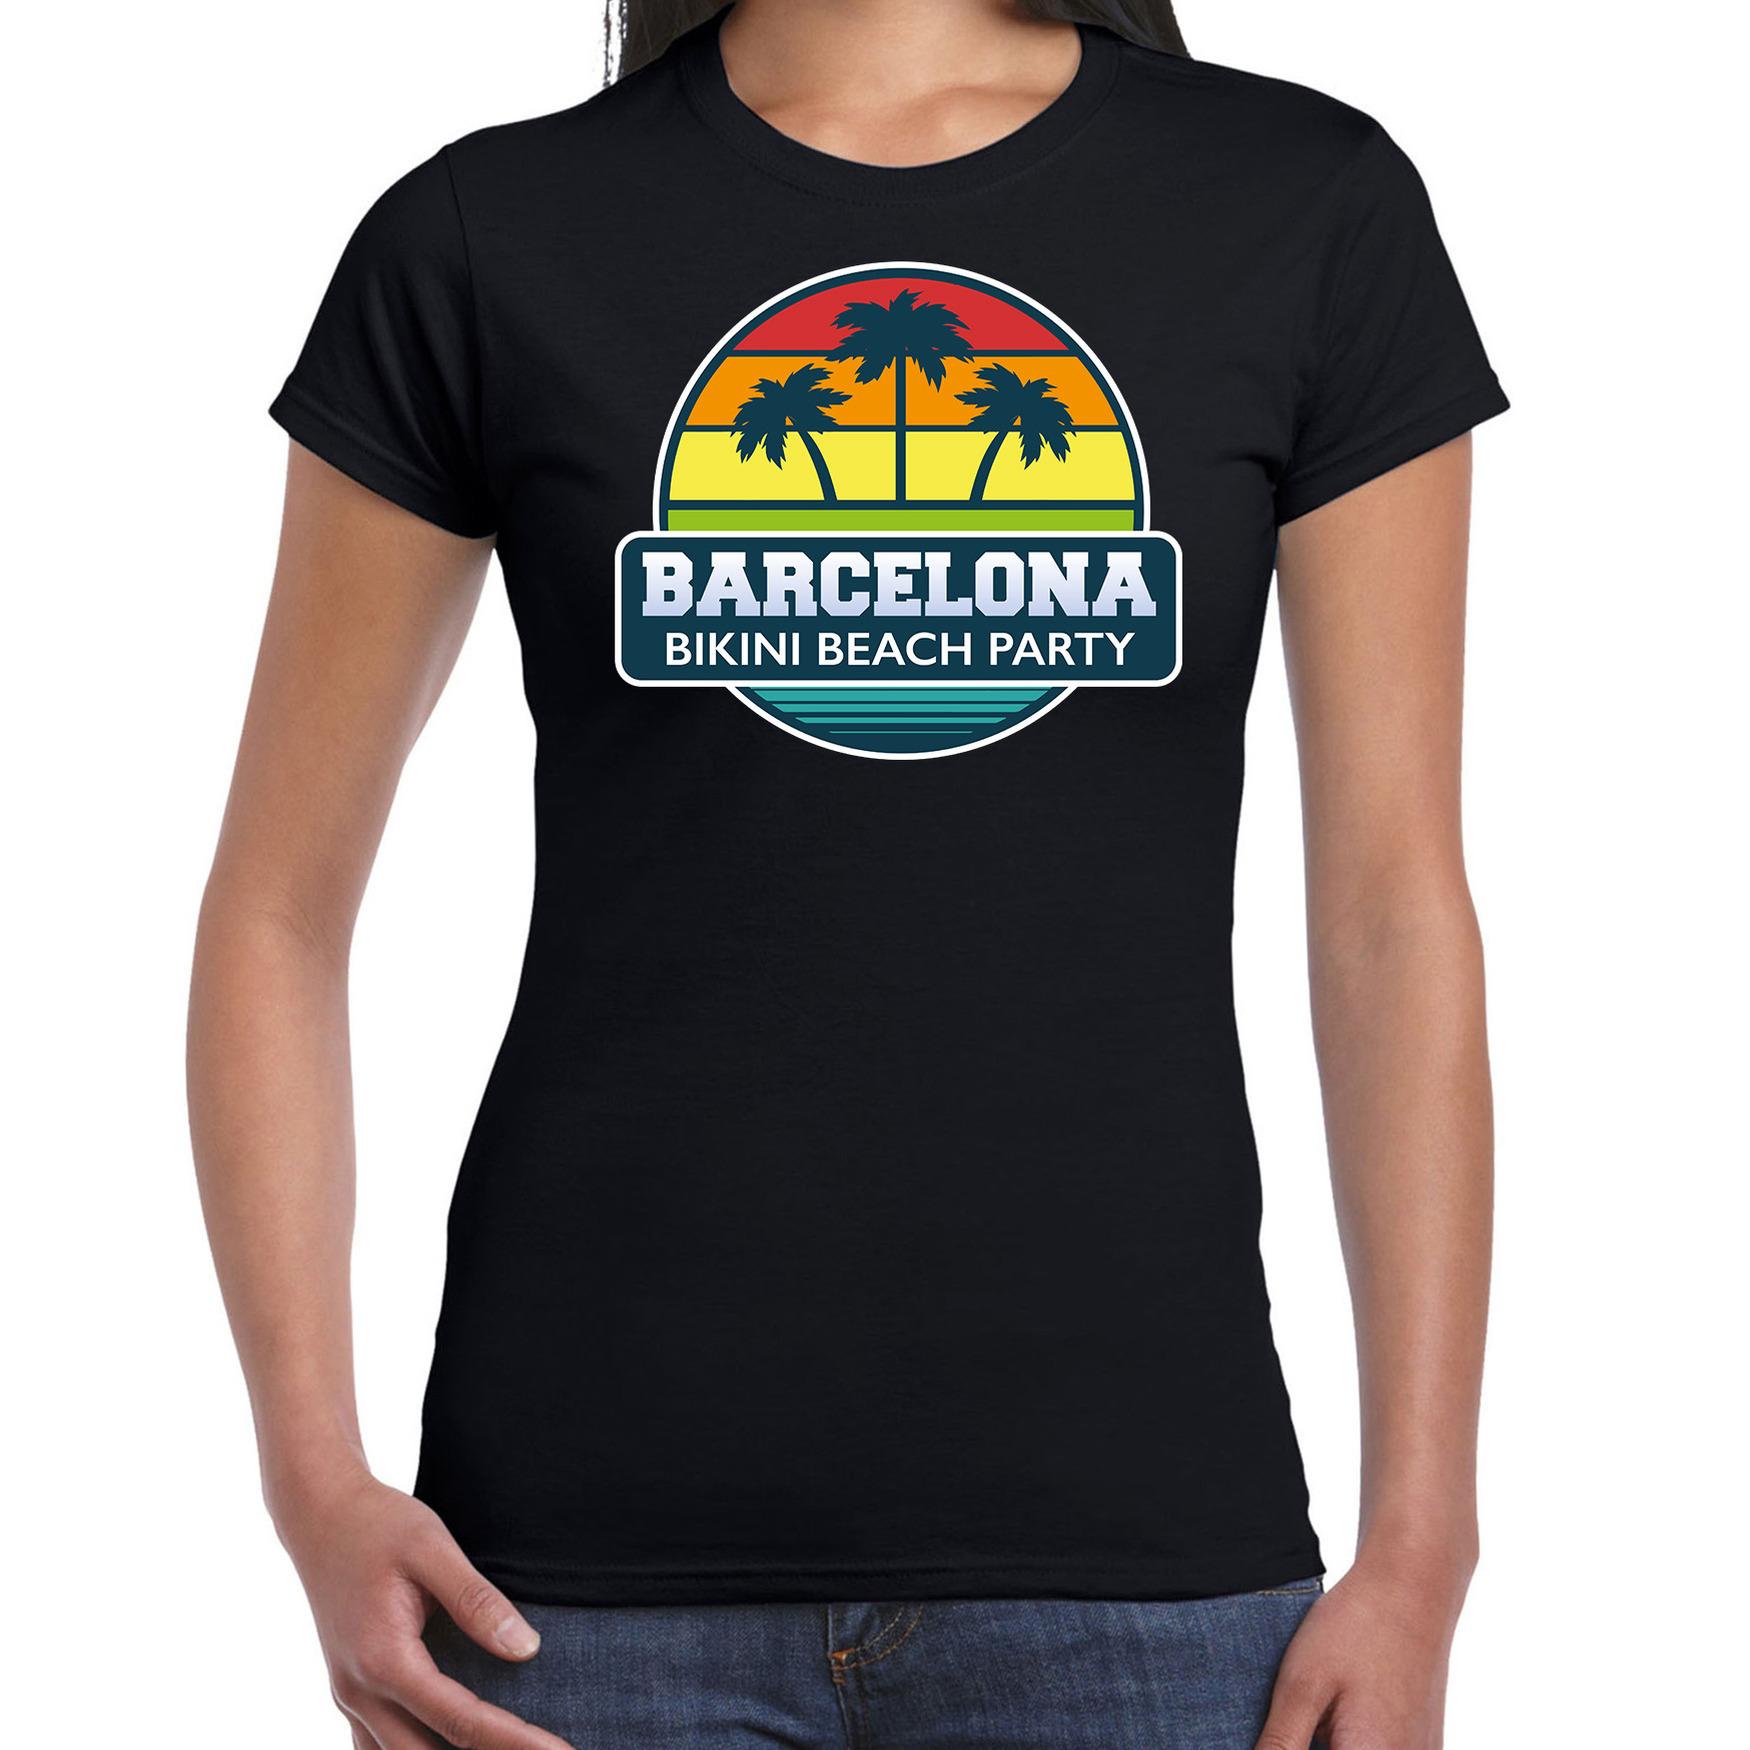 Barcelona zomer t-shirt / shirt Barcelona bikini beach party zwart voor dames